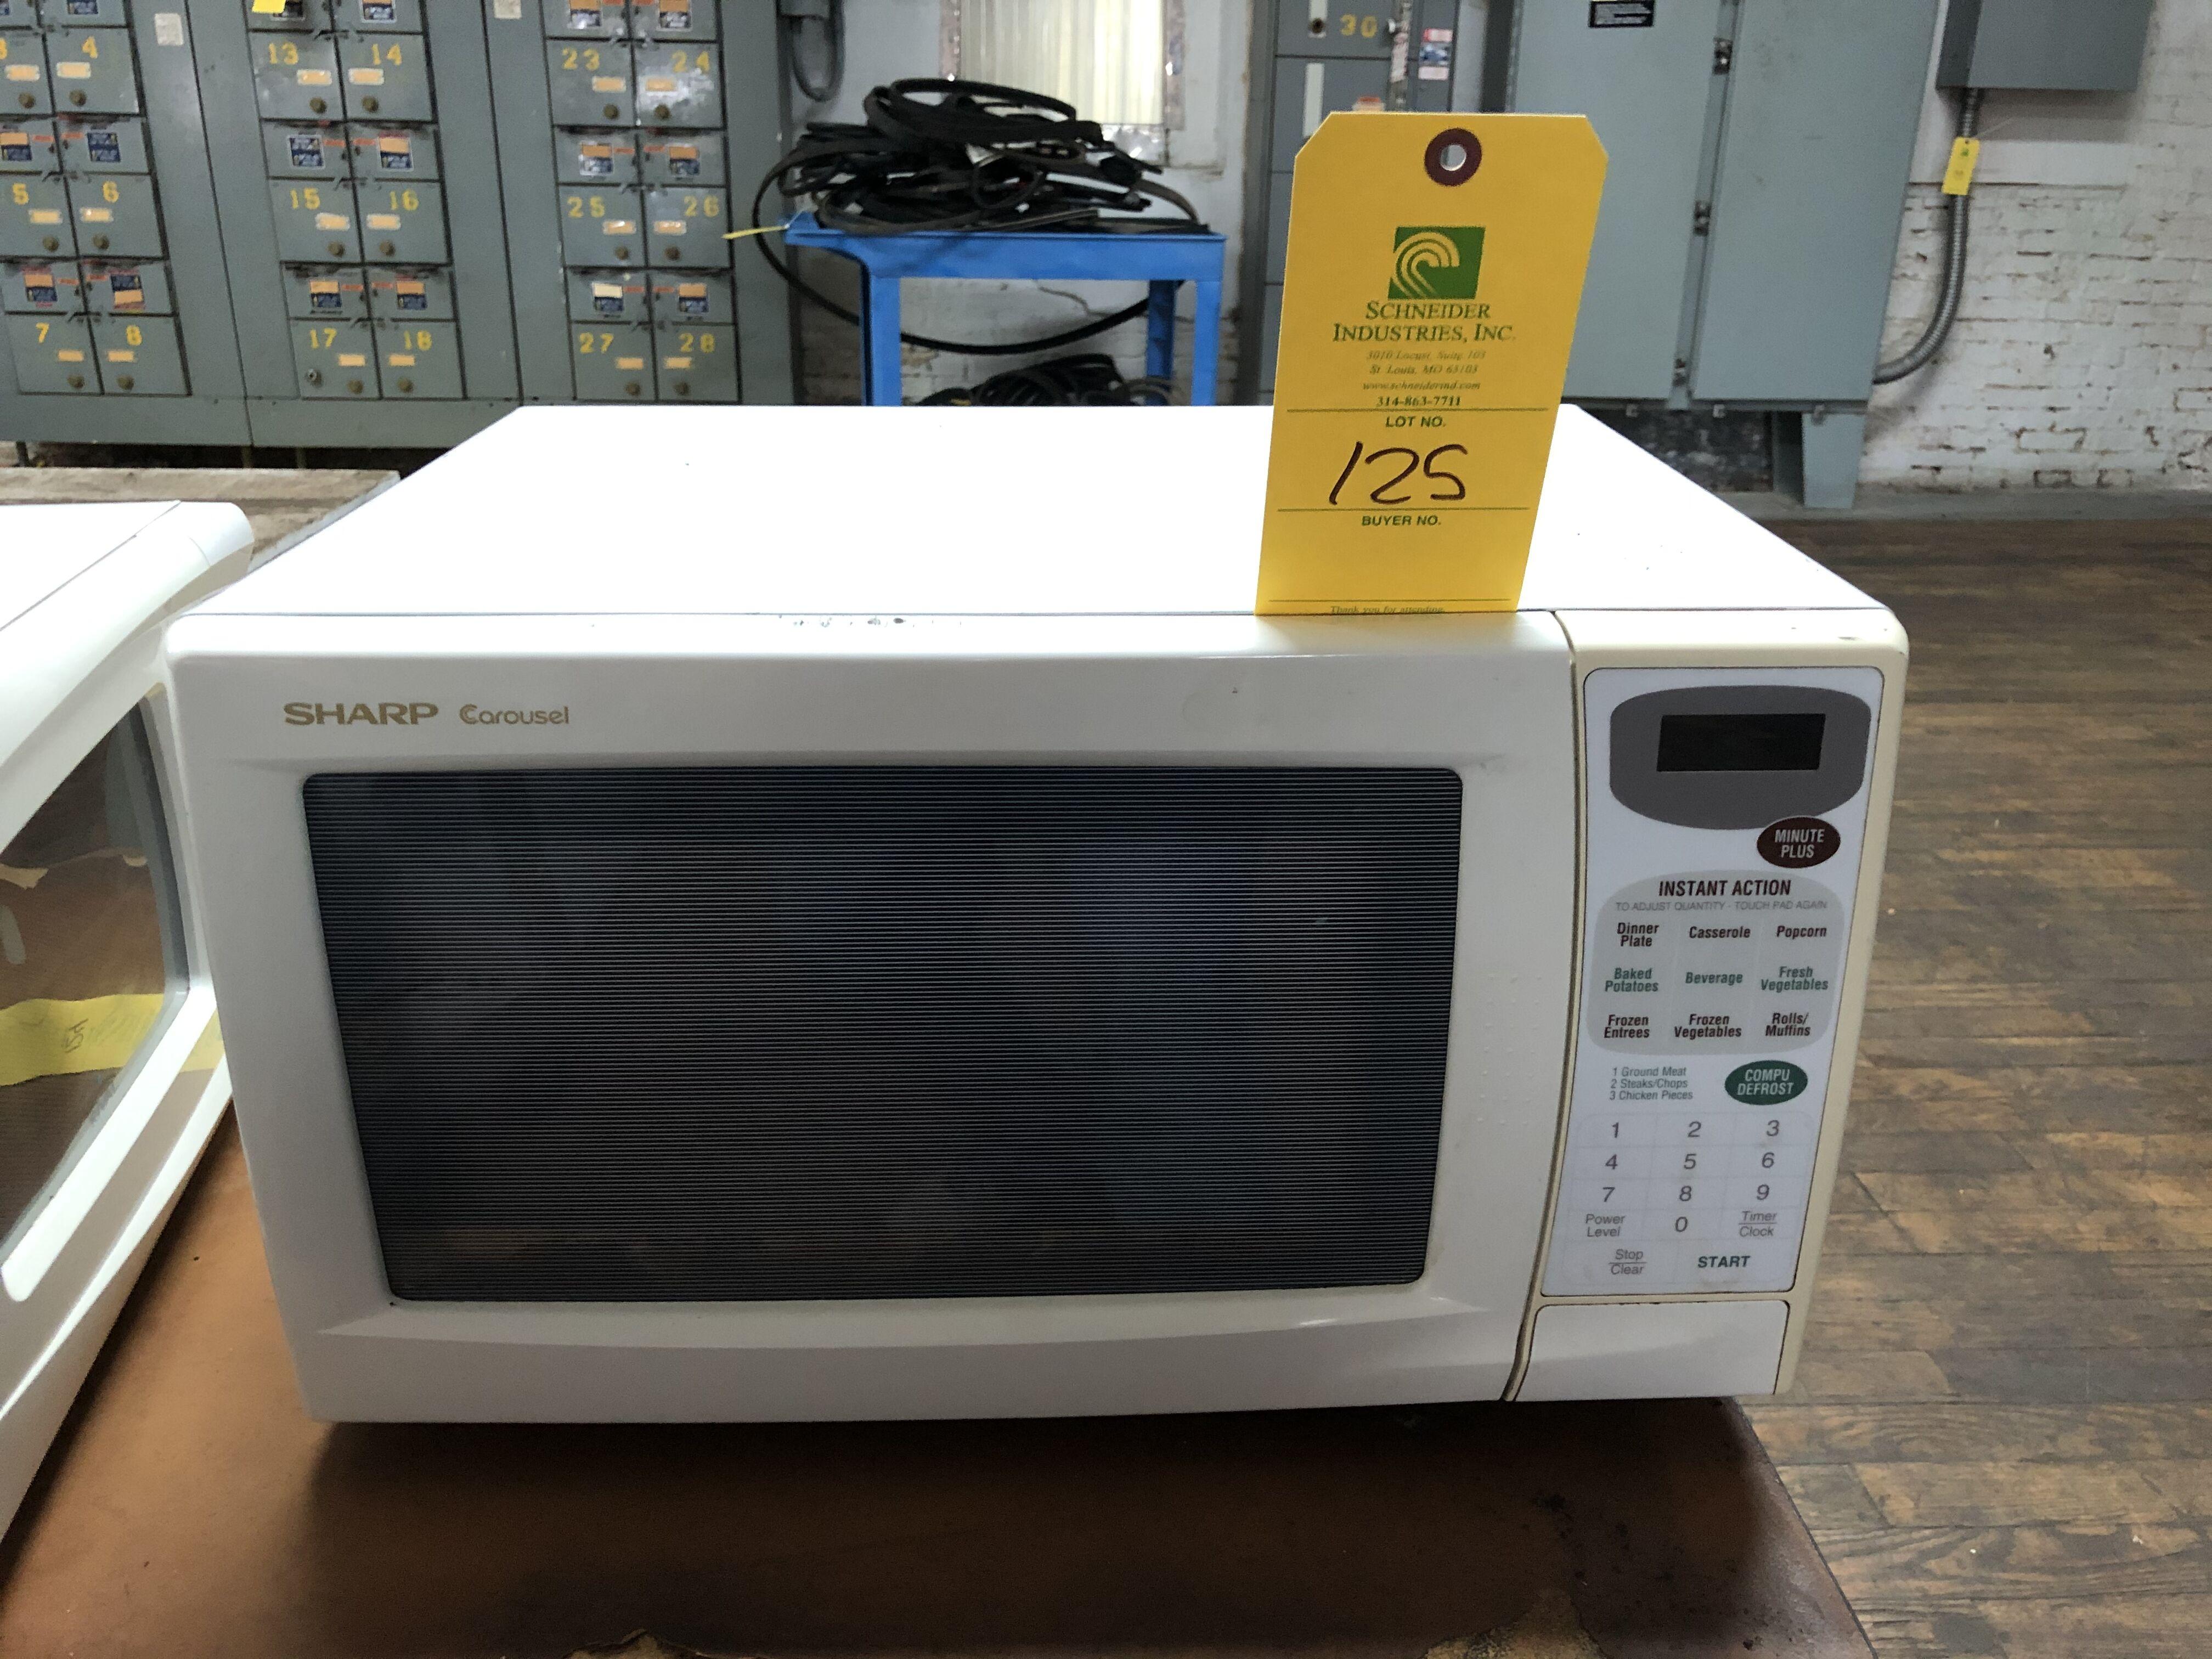 Lot 125 - Sharp Carousel Microwave